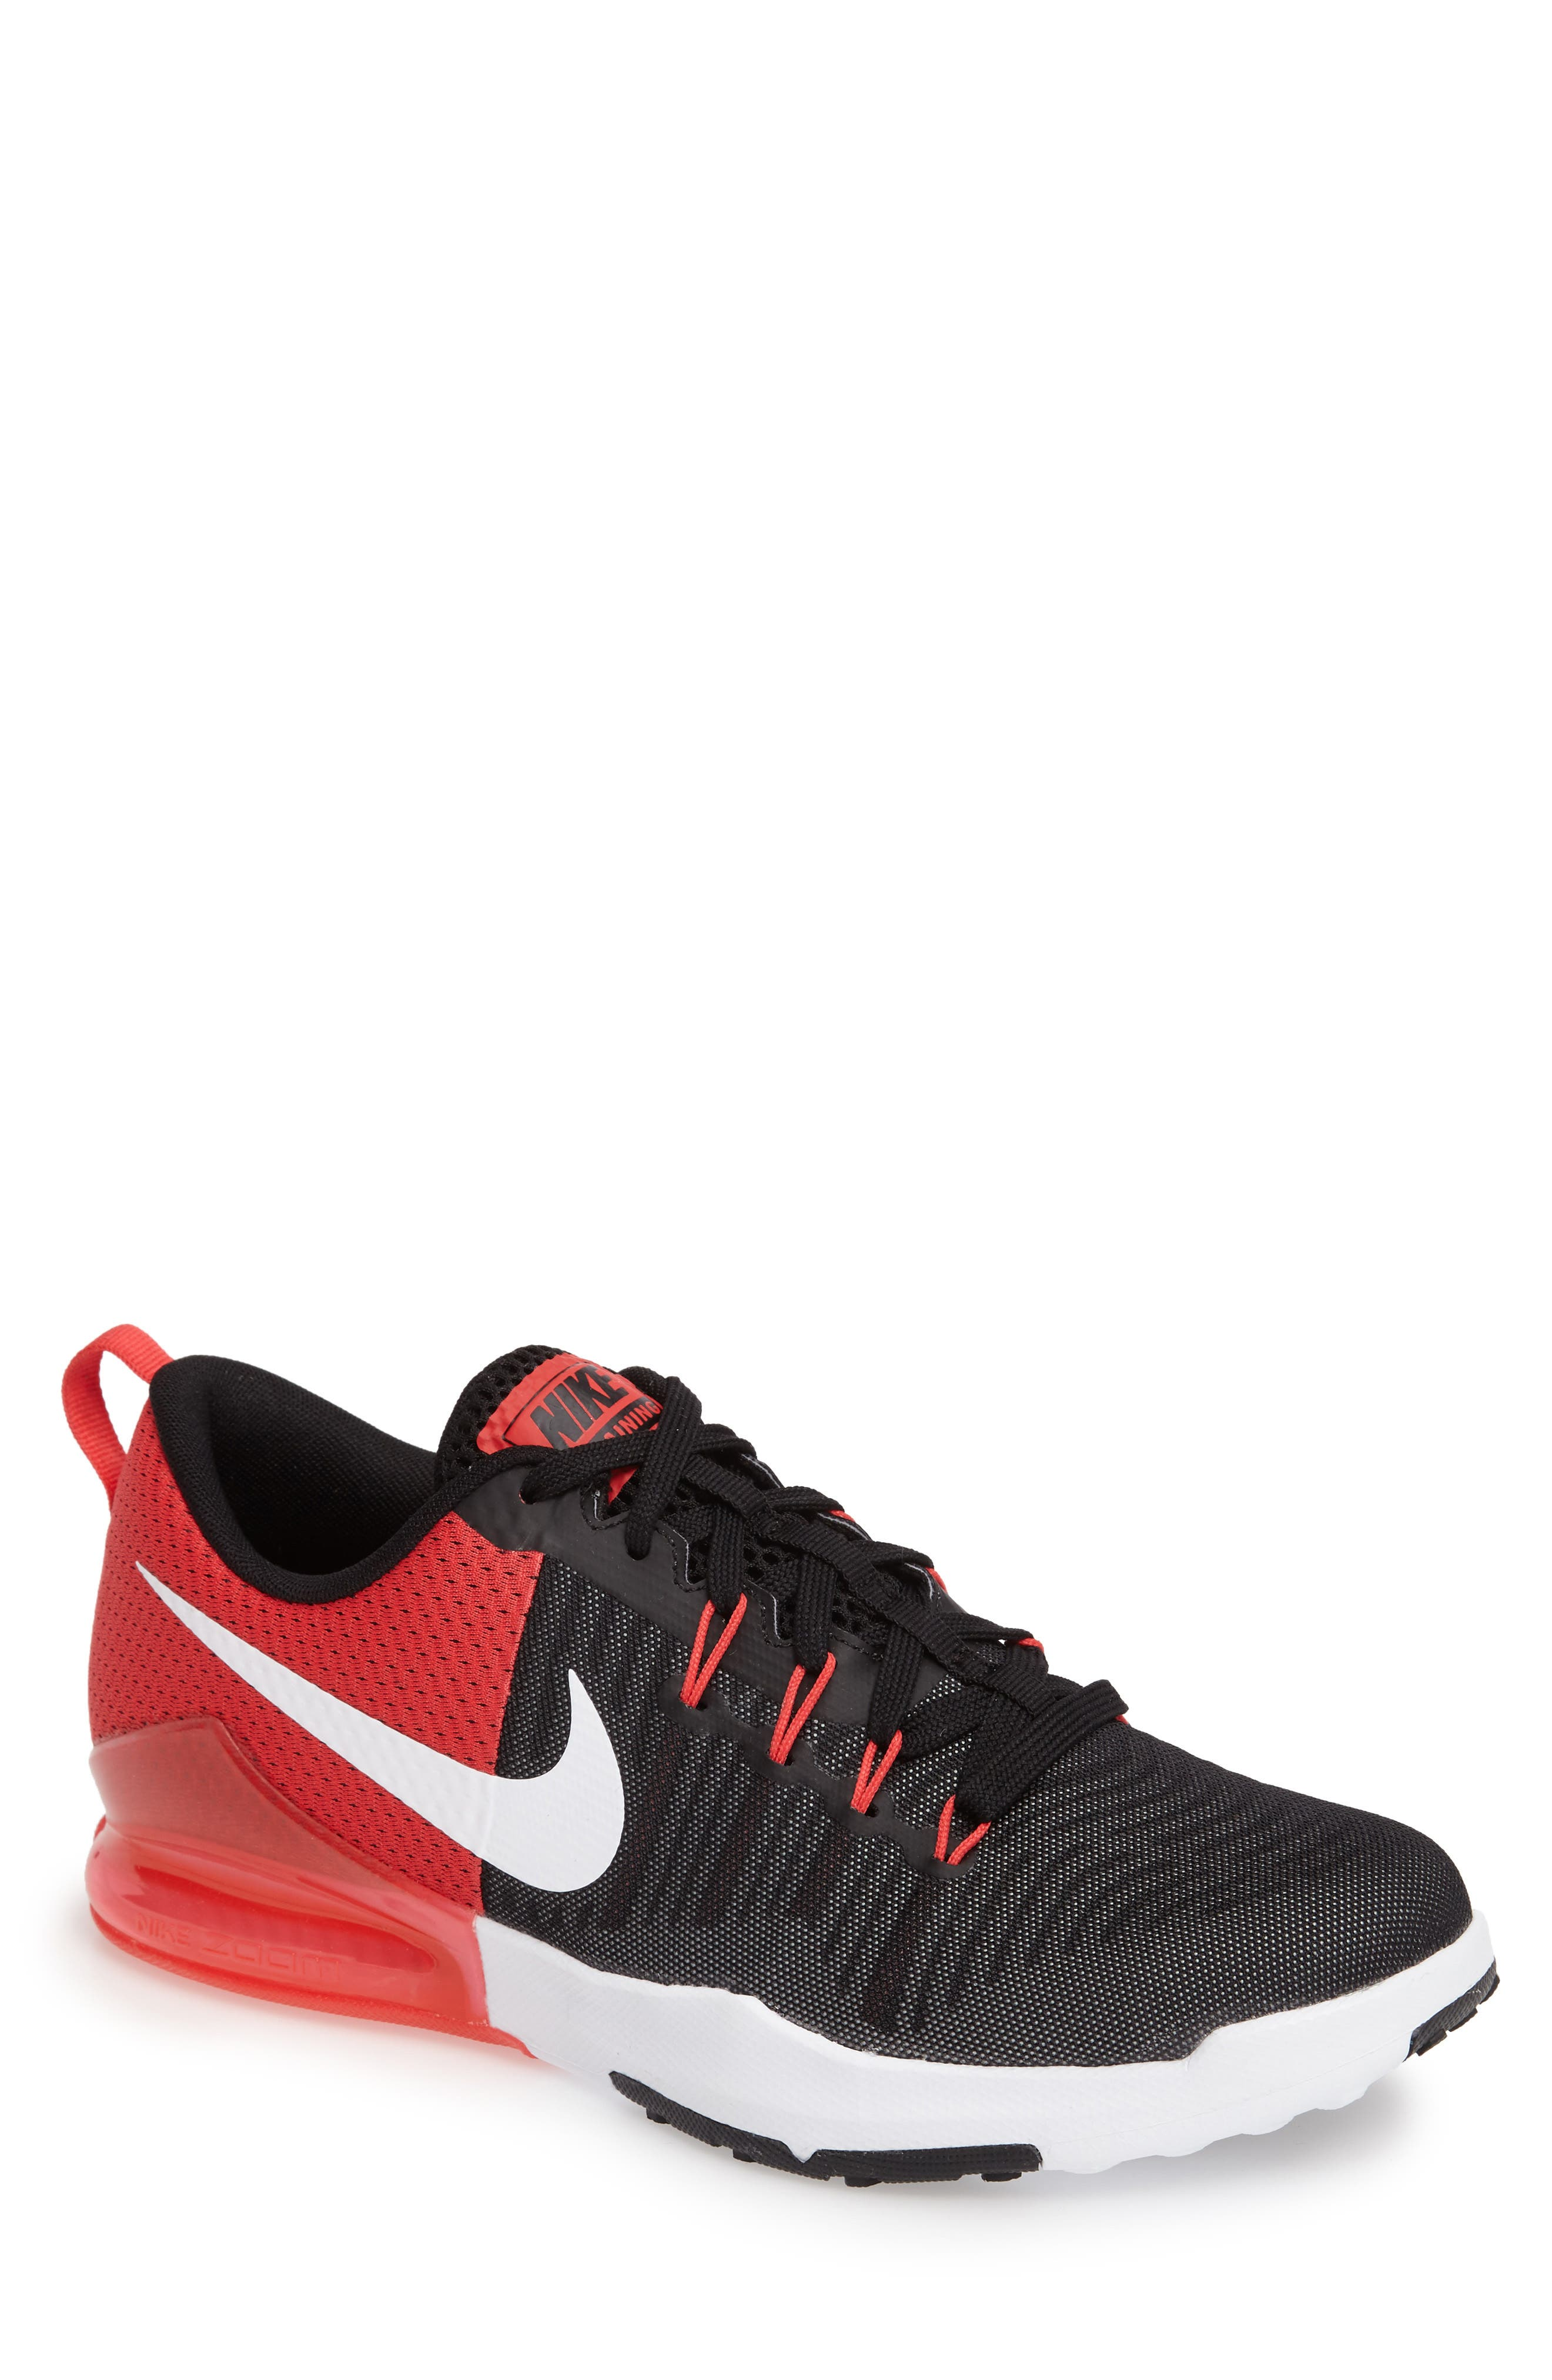 Main Image - Nike Zoom Train Action Training Shoe (Men)